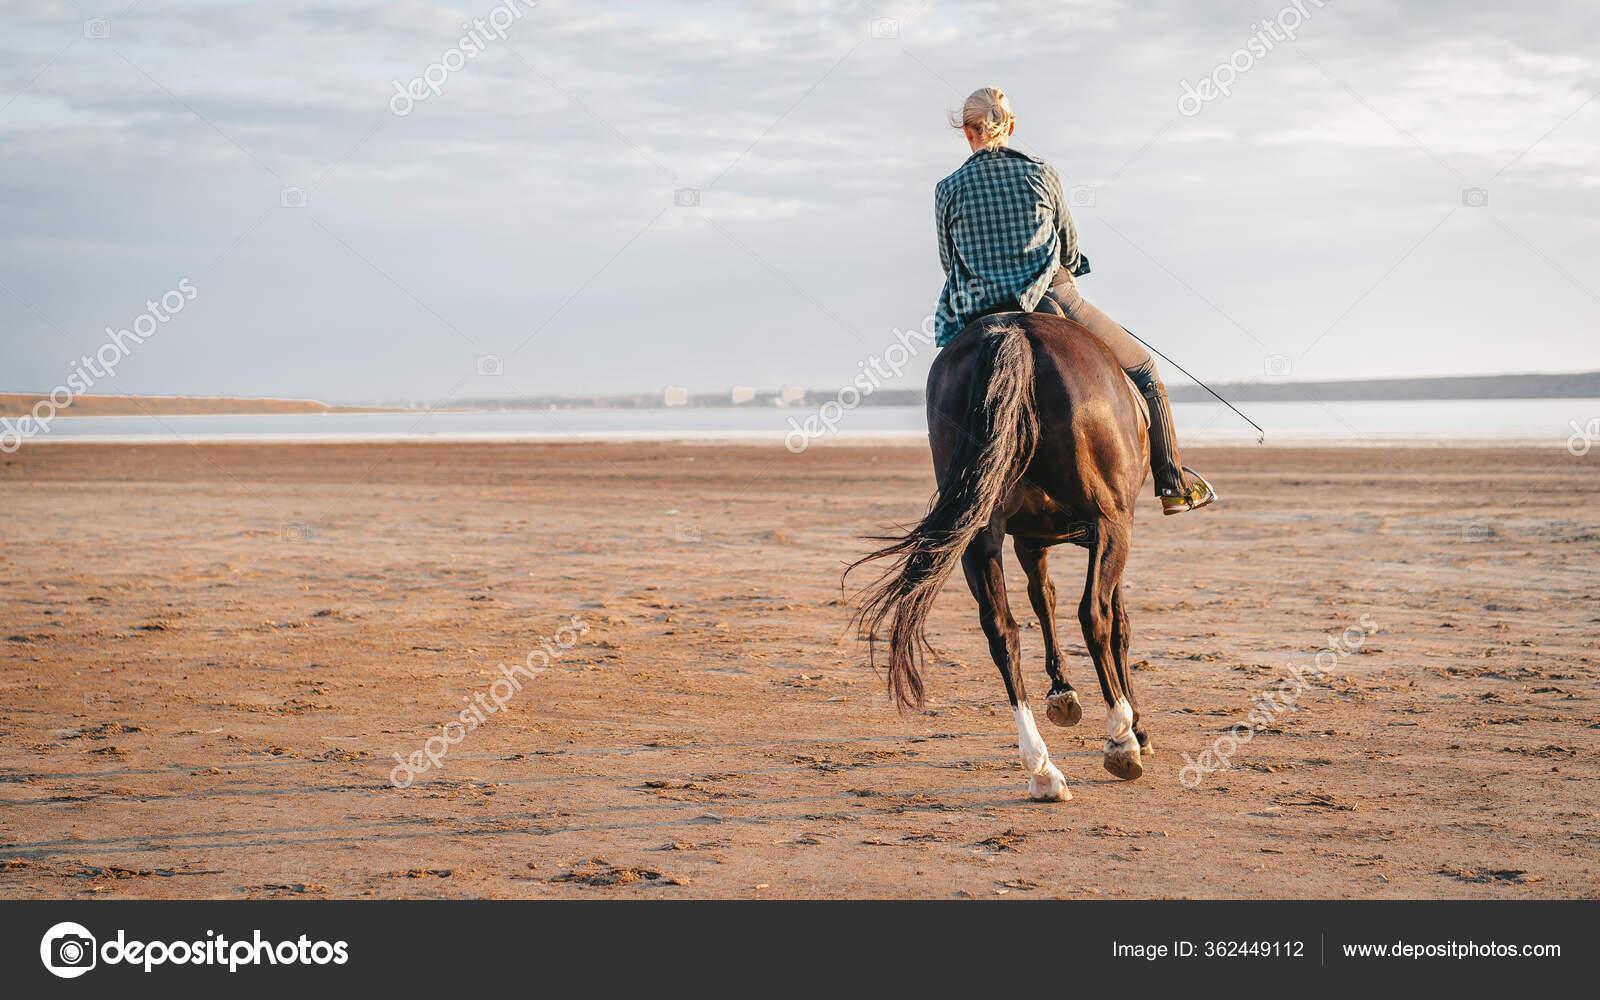 Woman Rides Horse On Beautiful Autumn Nature Landscape By River Or Lake Concept Of Farm Animals Training Horse Racing Stock Photo C Kohanova1991 362449112